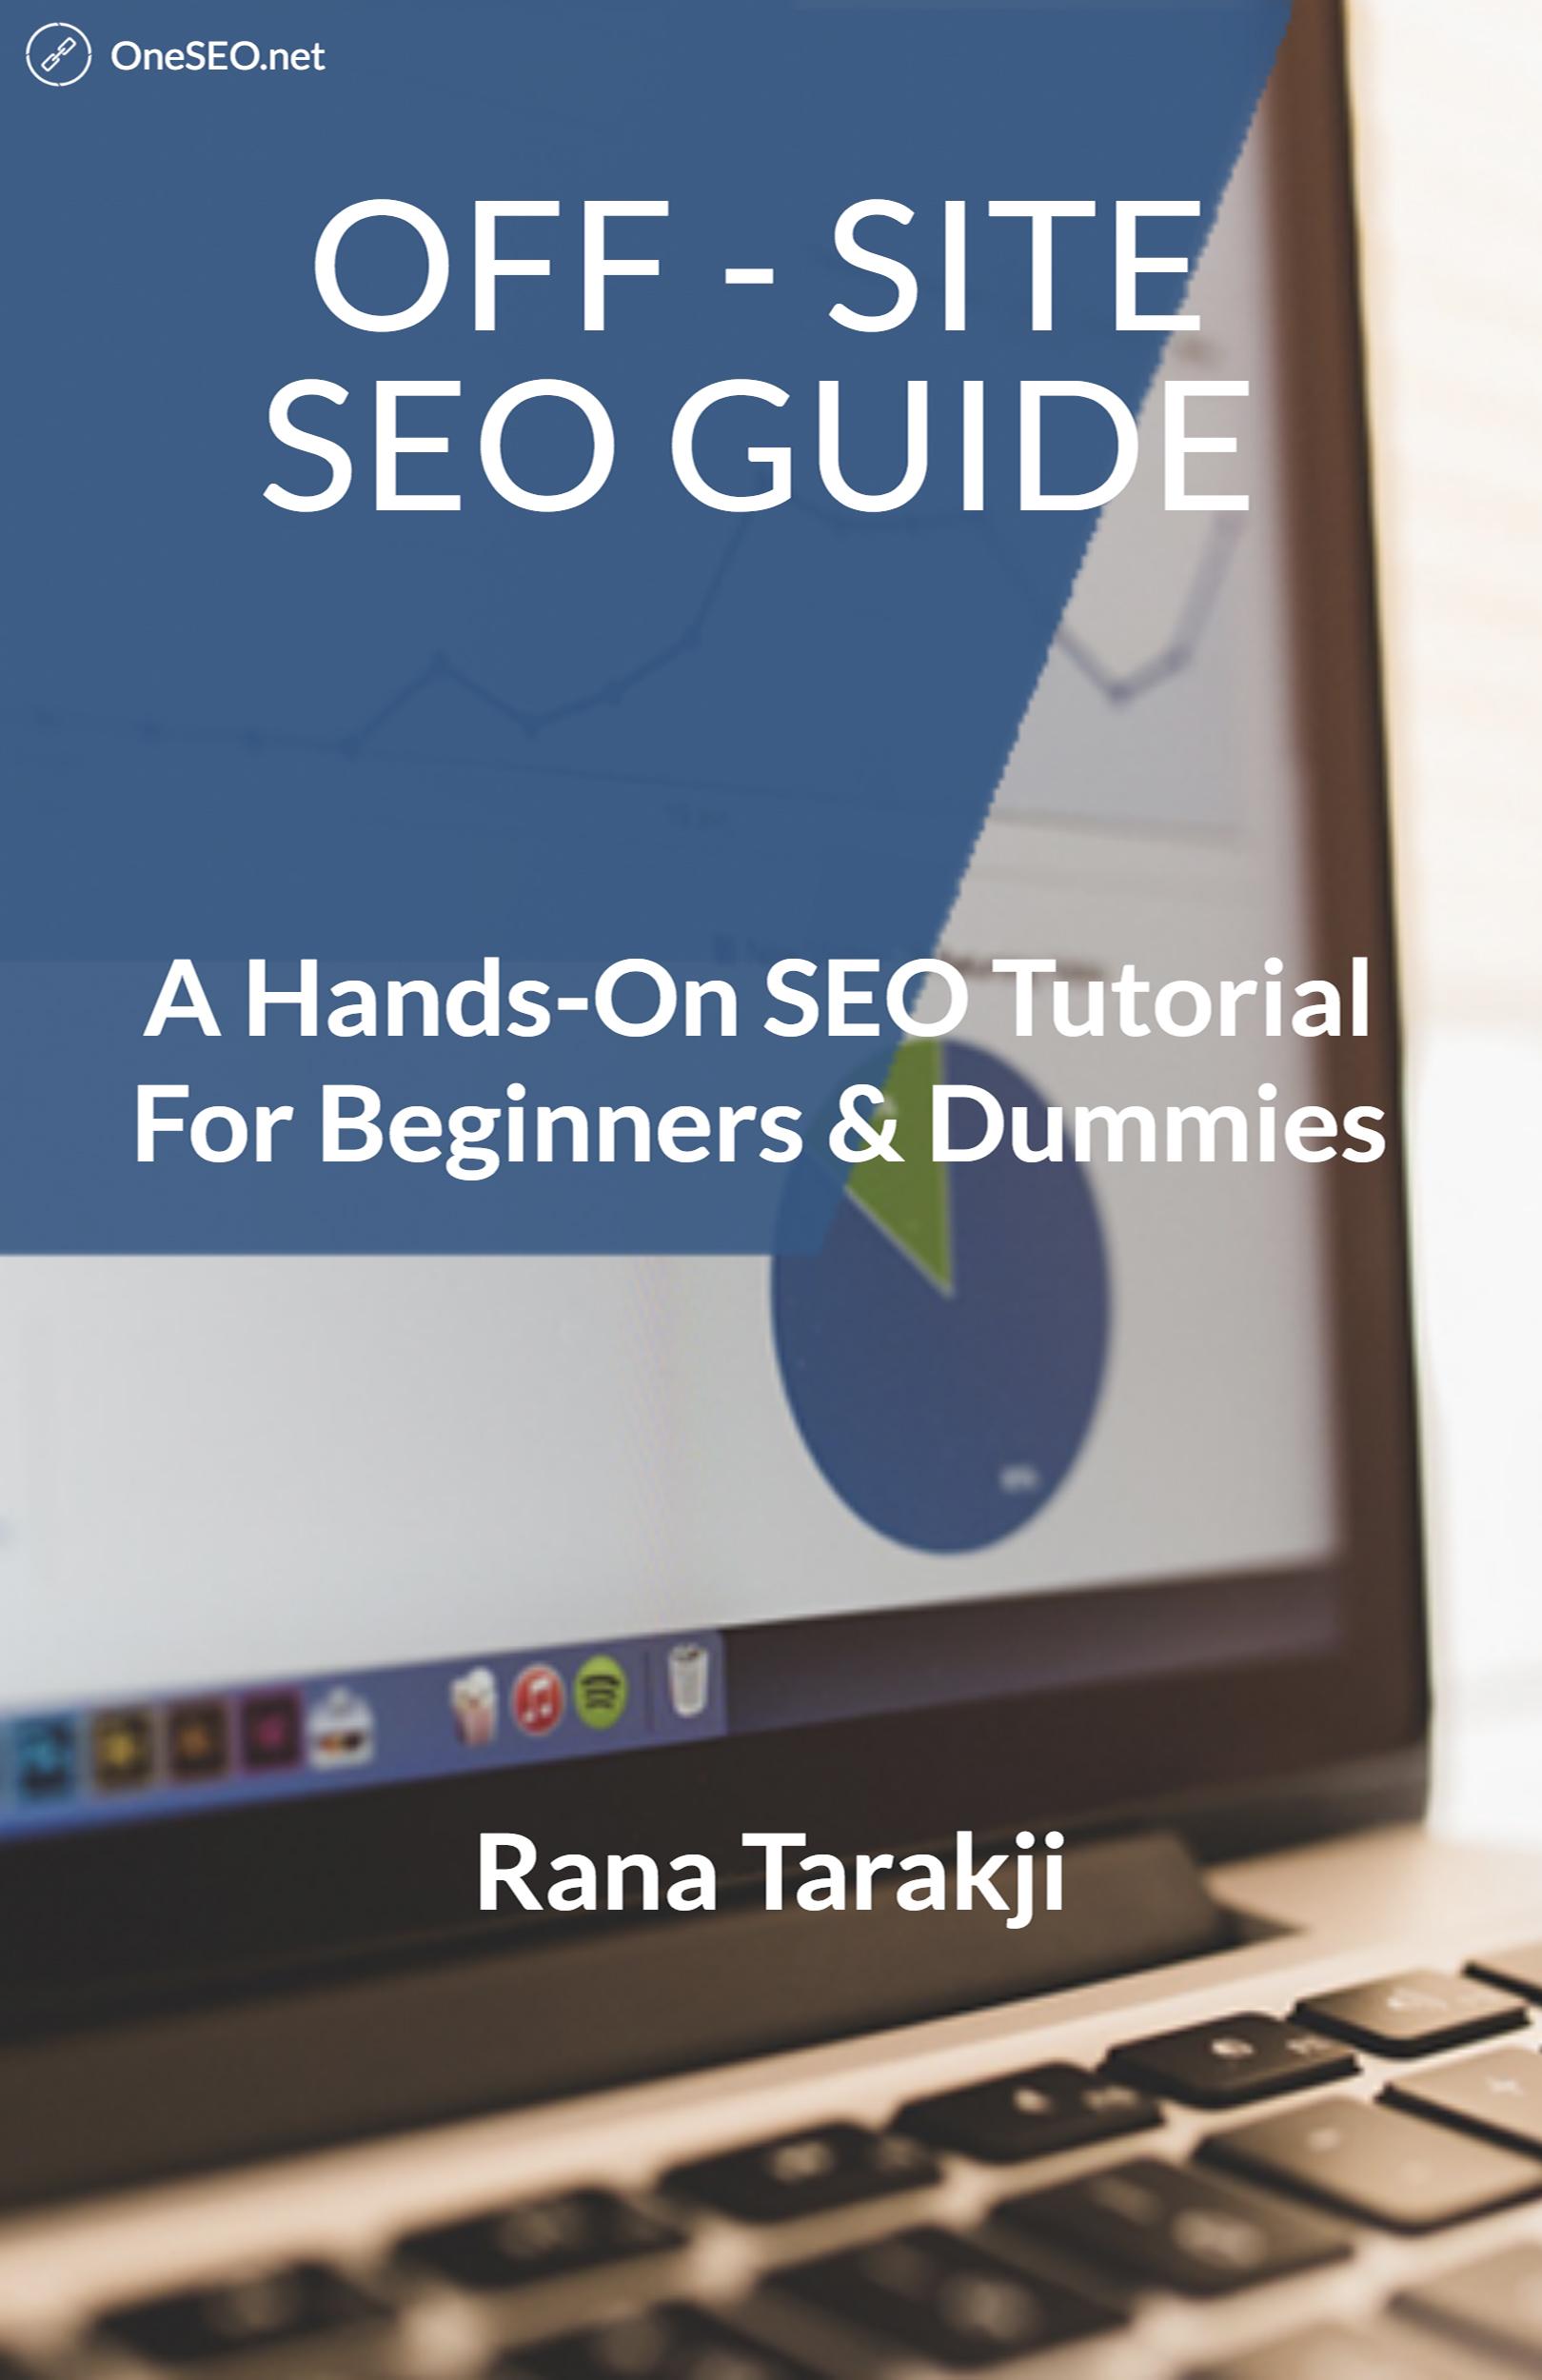 Off-Site SEO Guide: A Hands-On SEO Tutorial For Beginners & Dummies, an  Ebook by Rana Tarakji